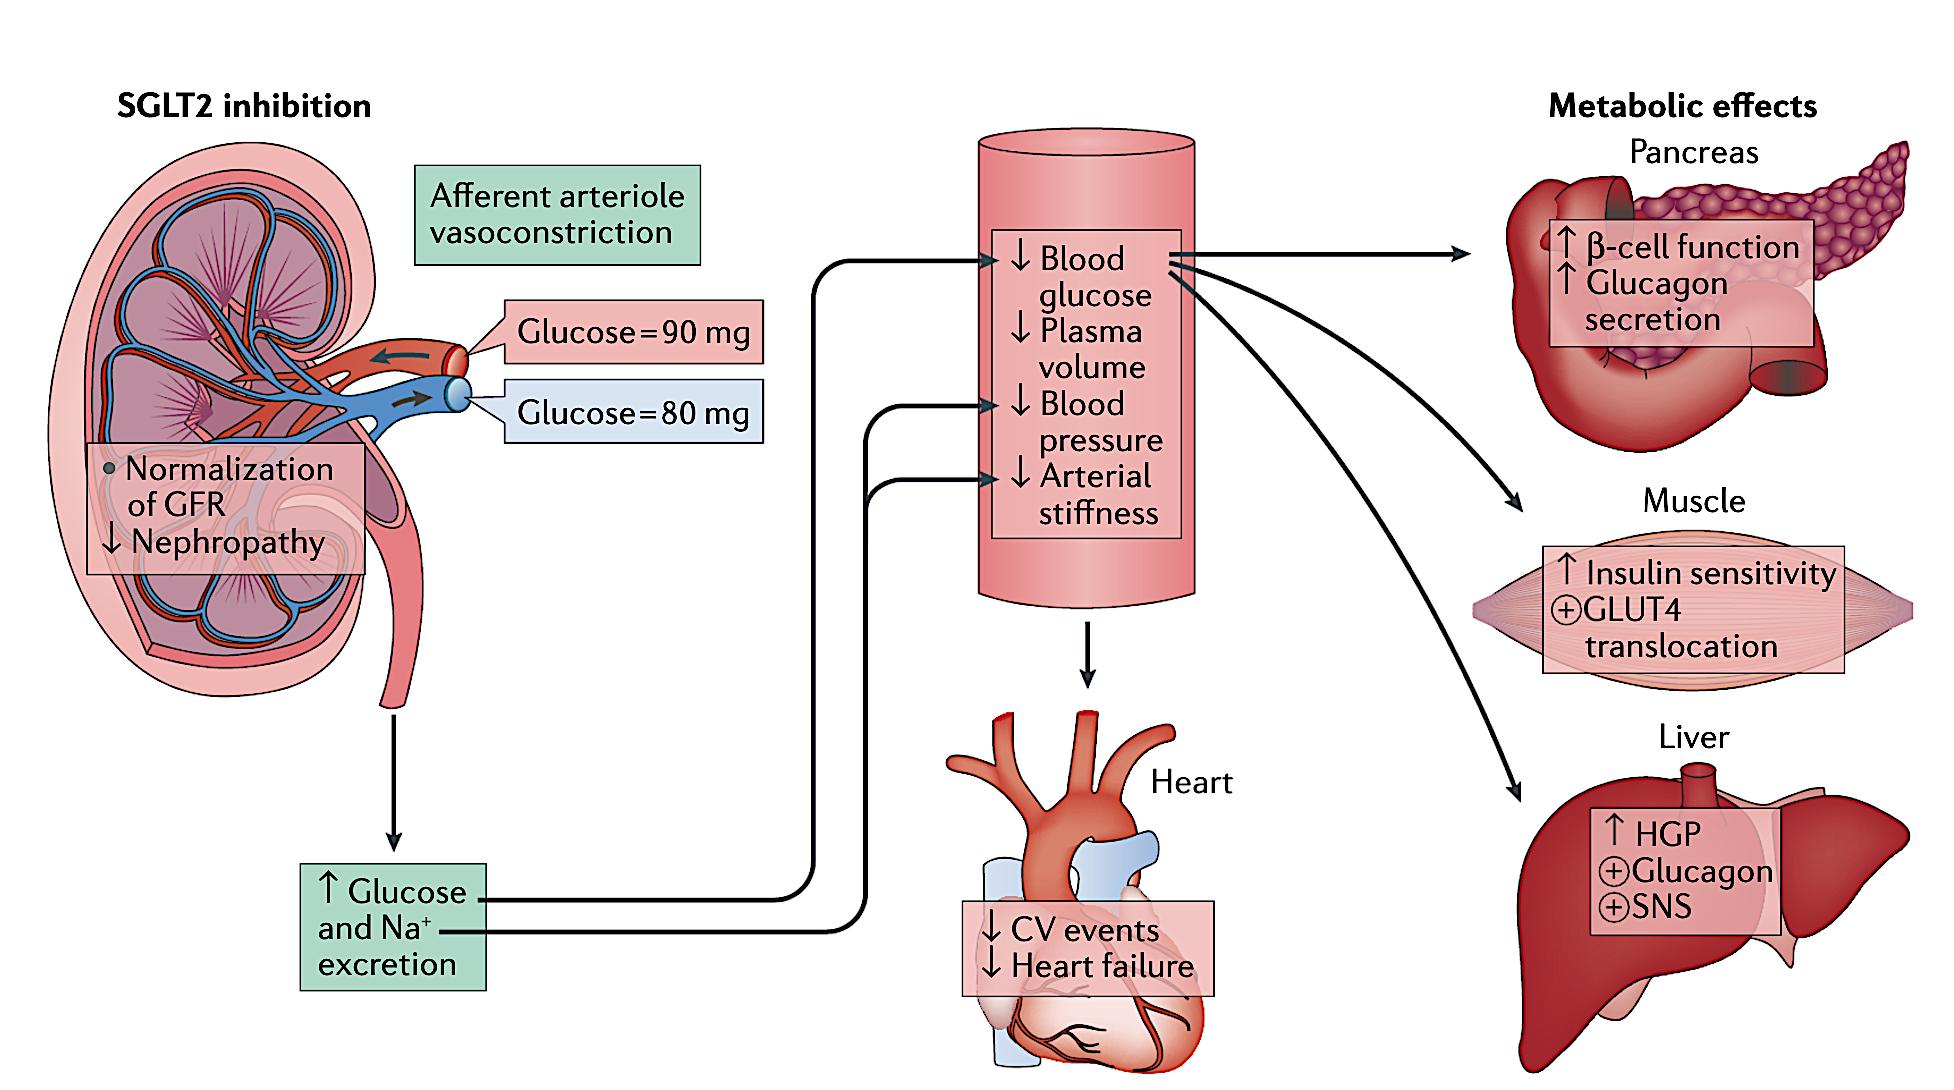 SGLT2 inhibition and Blood Pressure